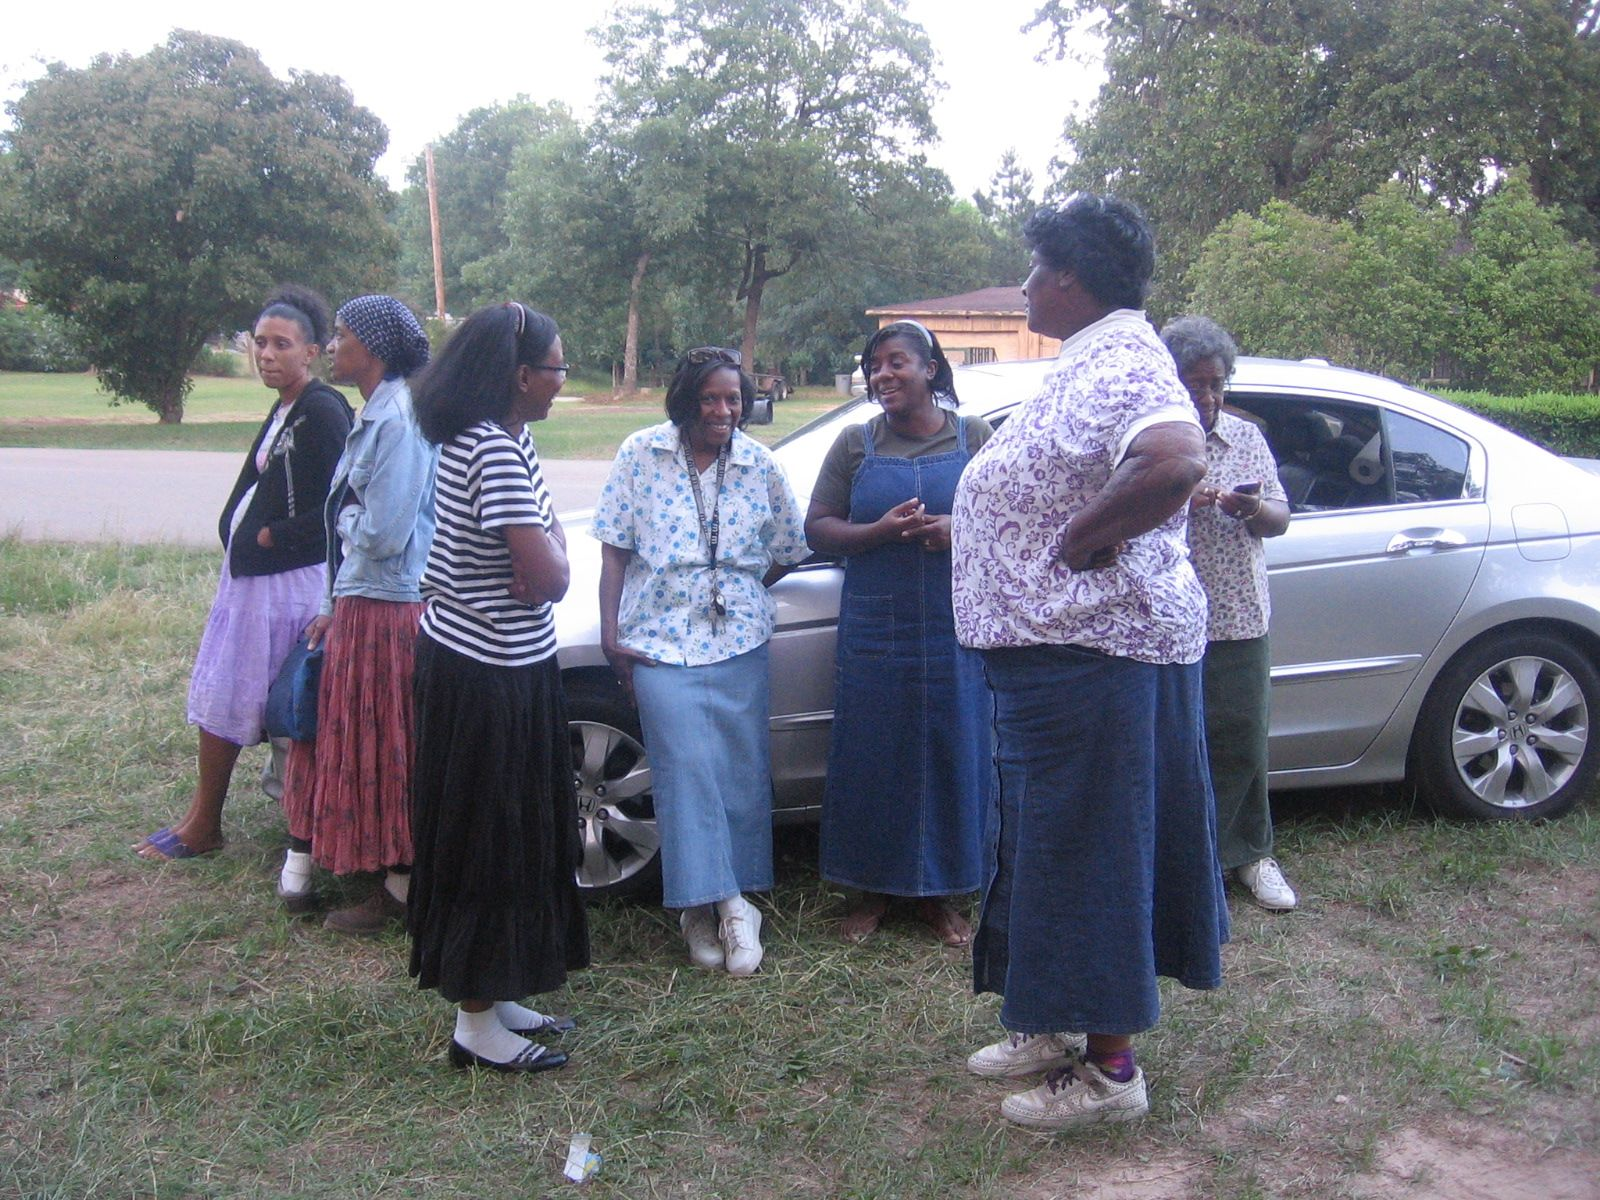 Why do Pentacostal women wear dresses and skirts? Women